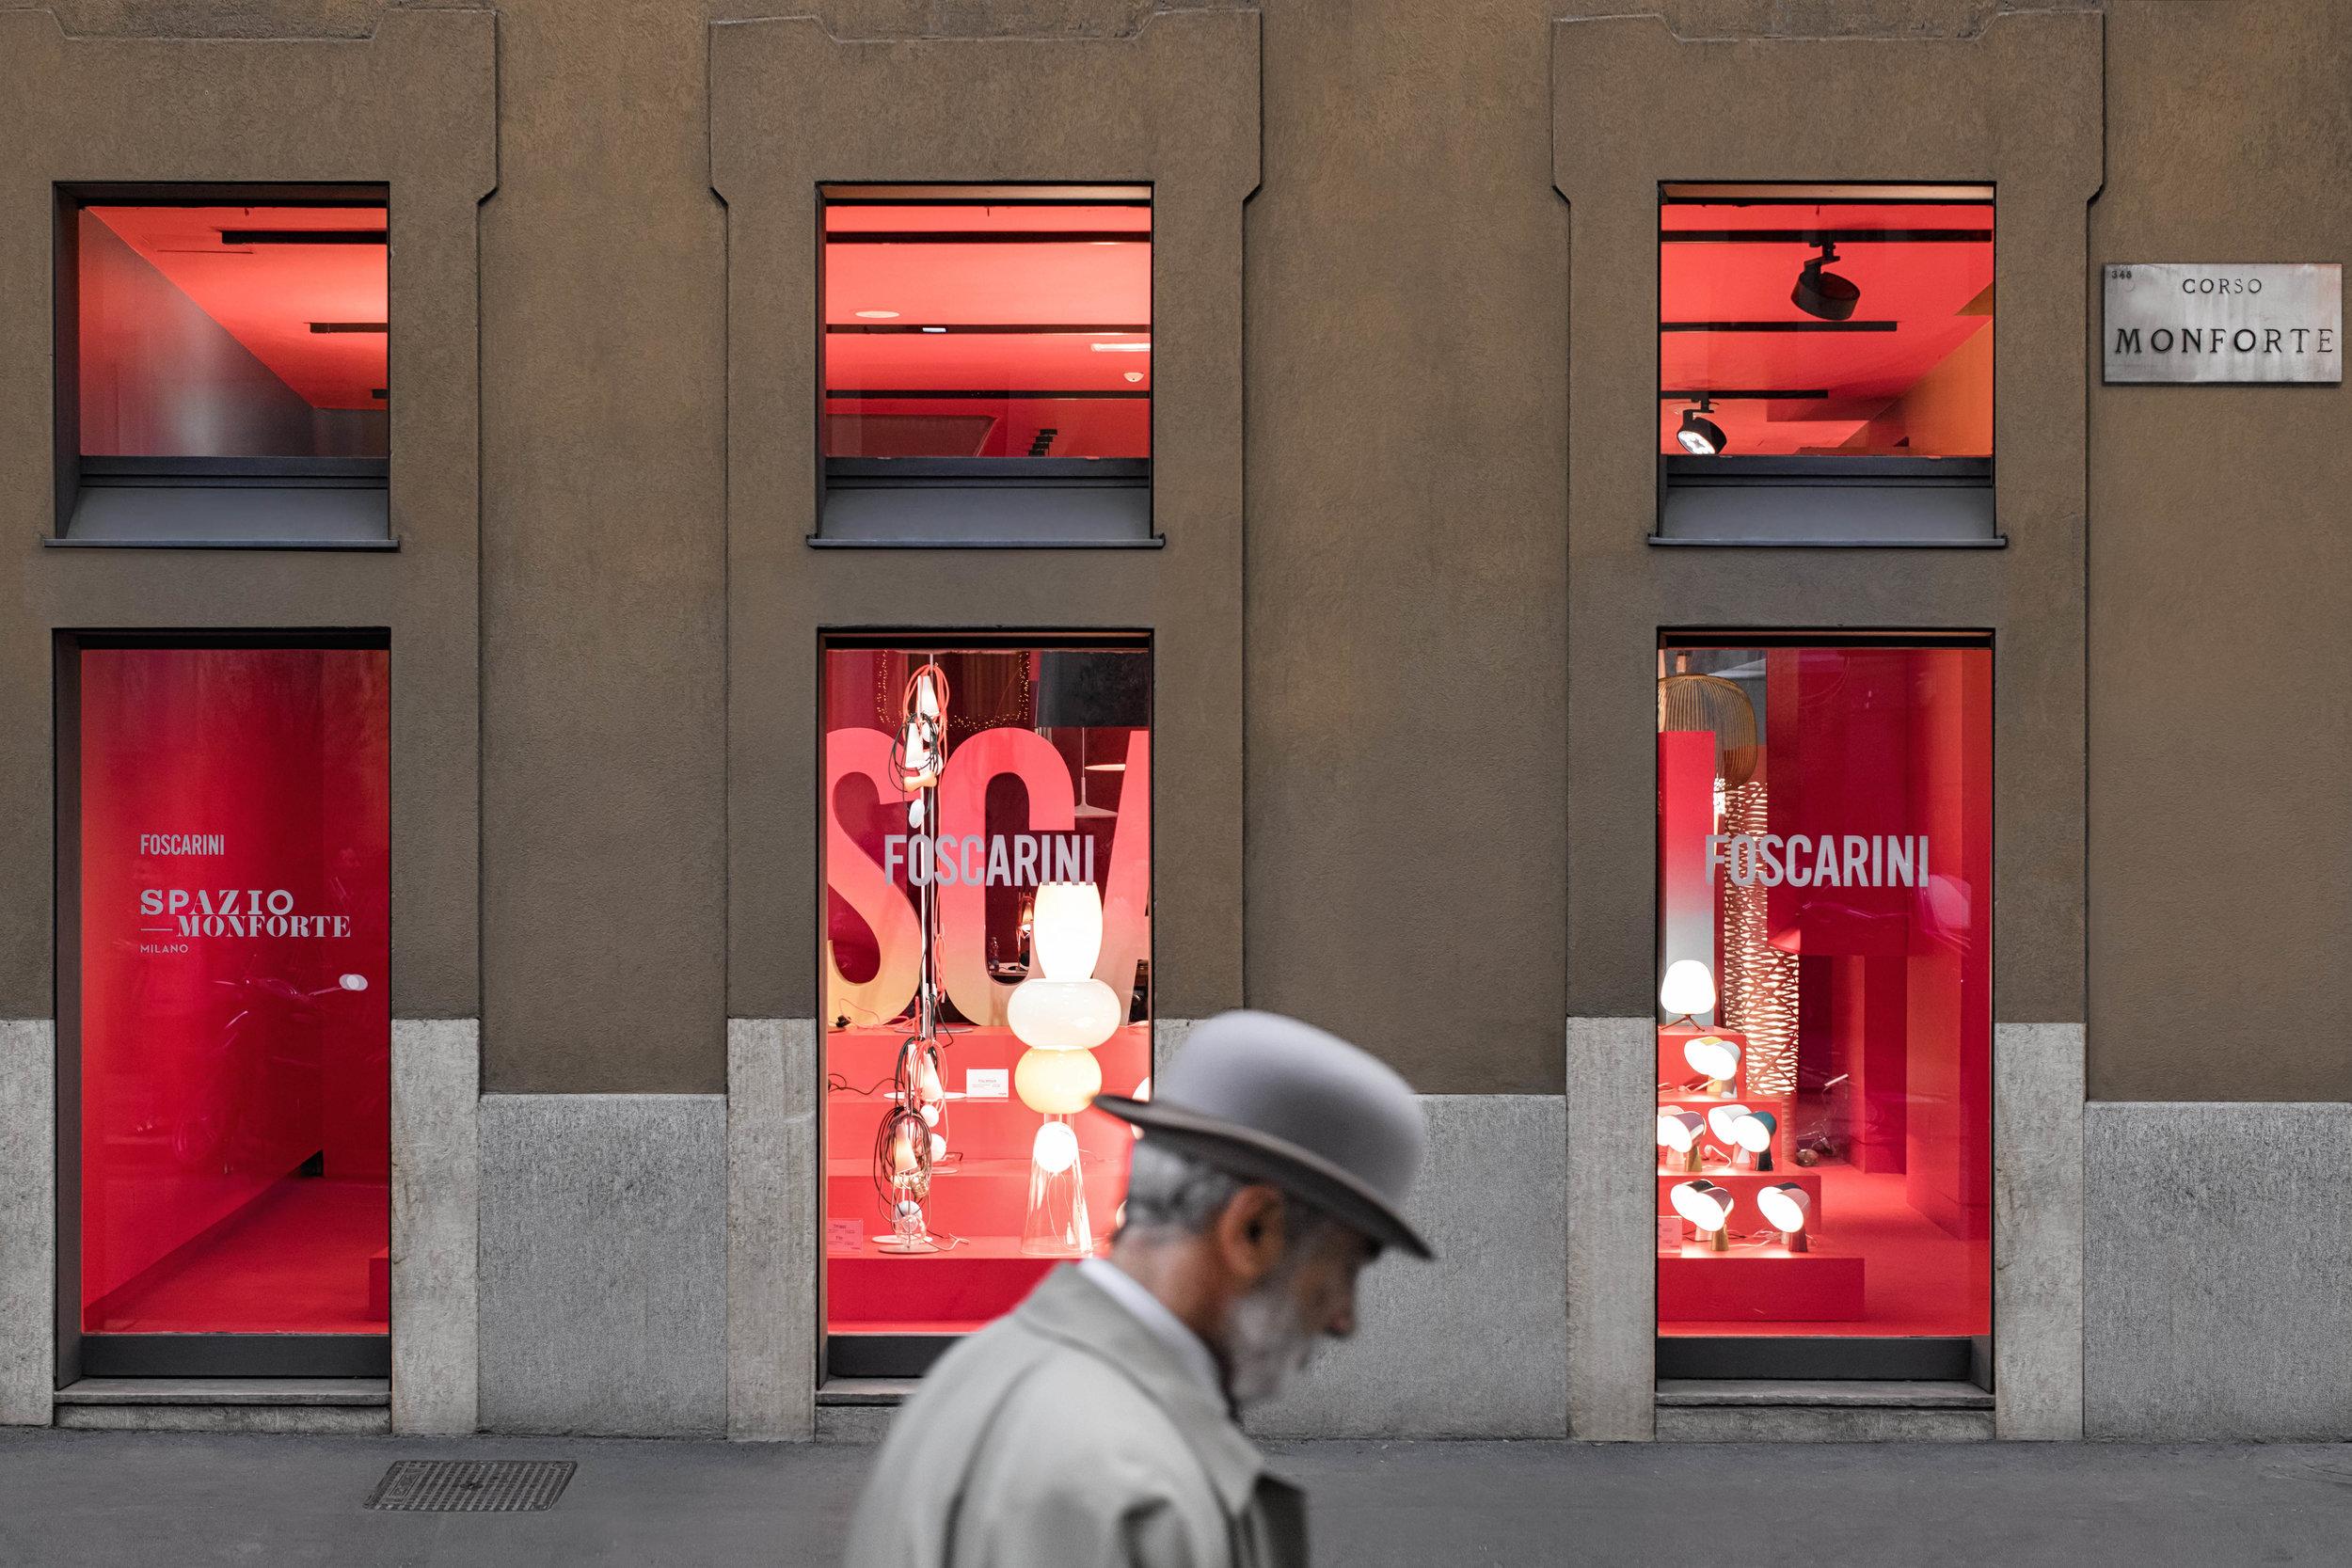 Foscarini-_SpazioMonforte_1.jpg